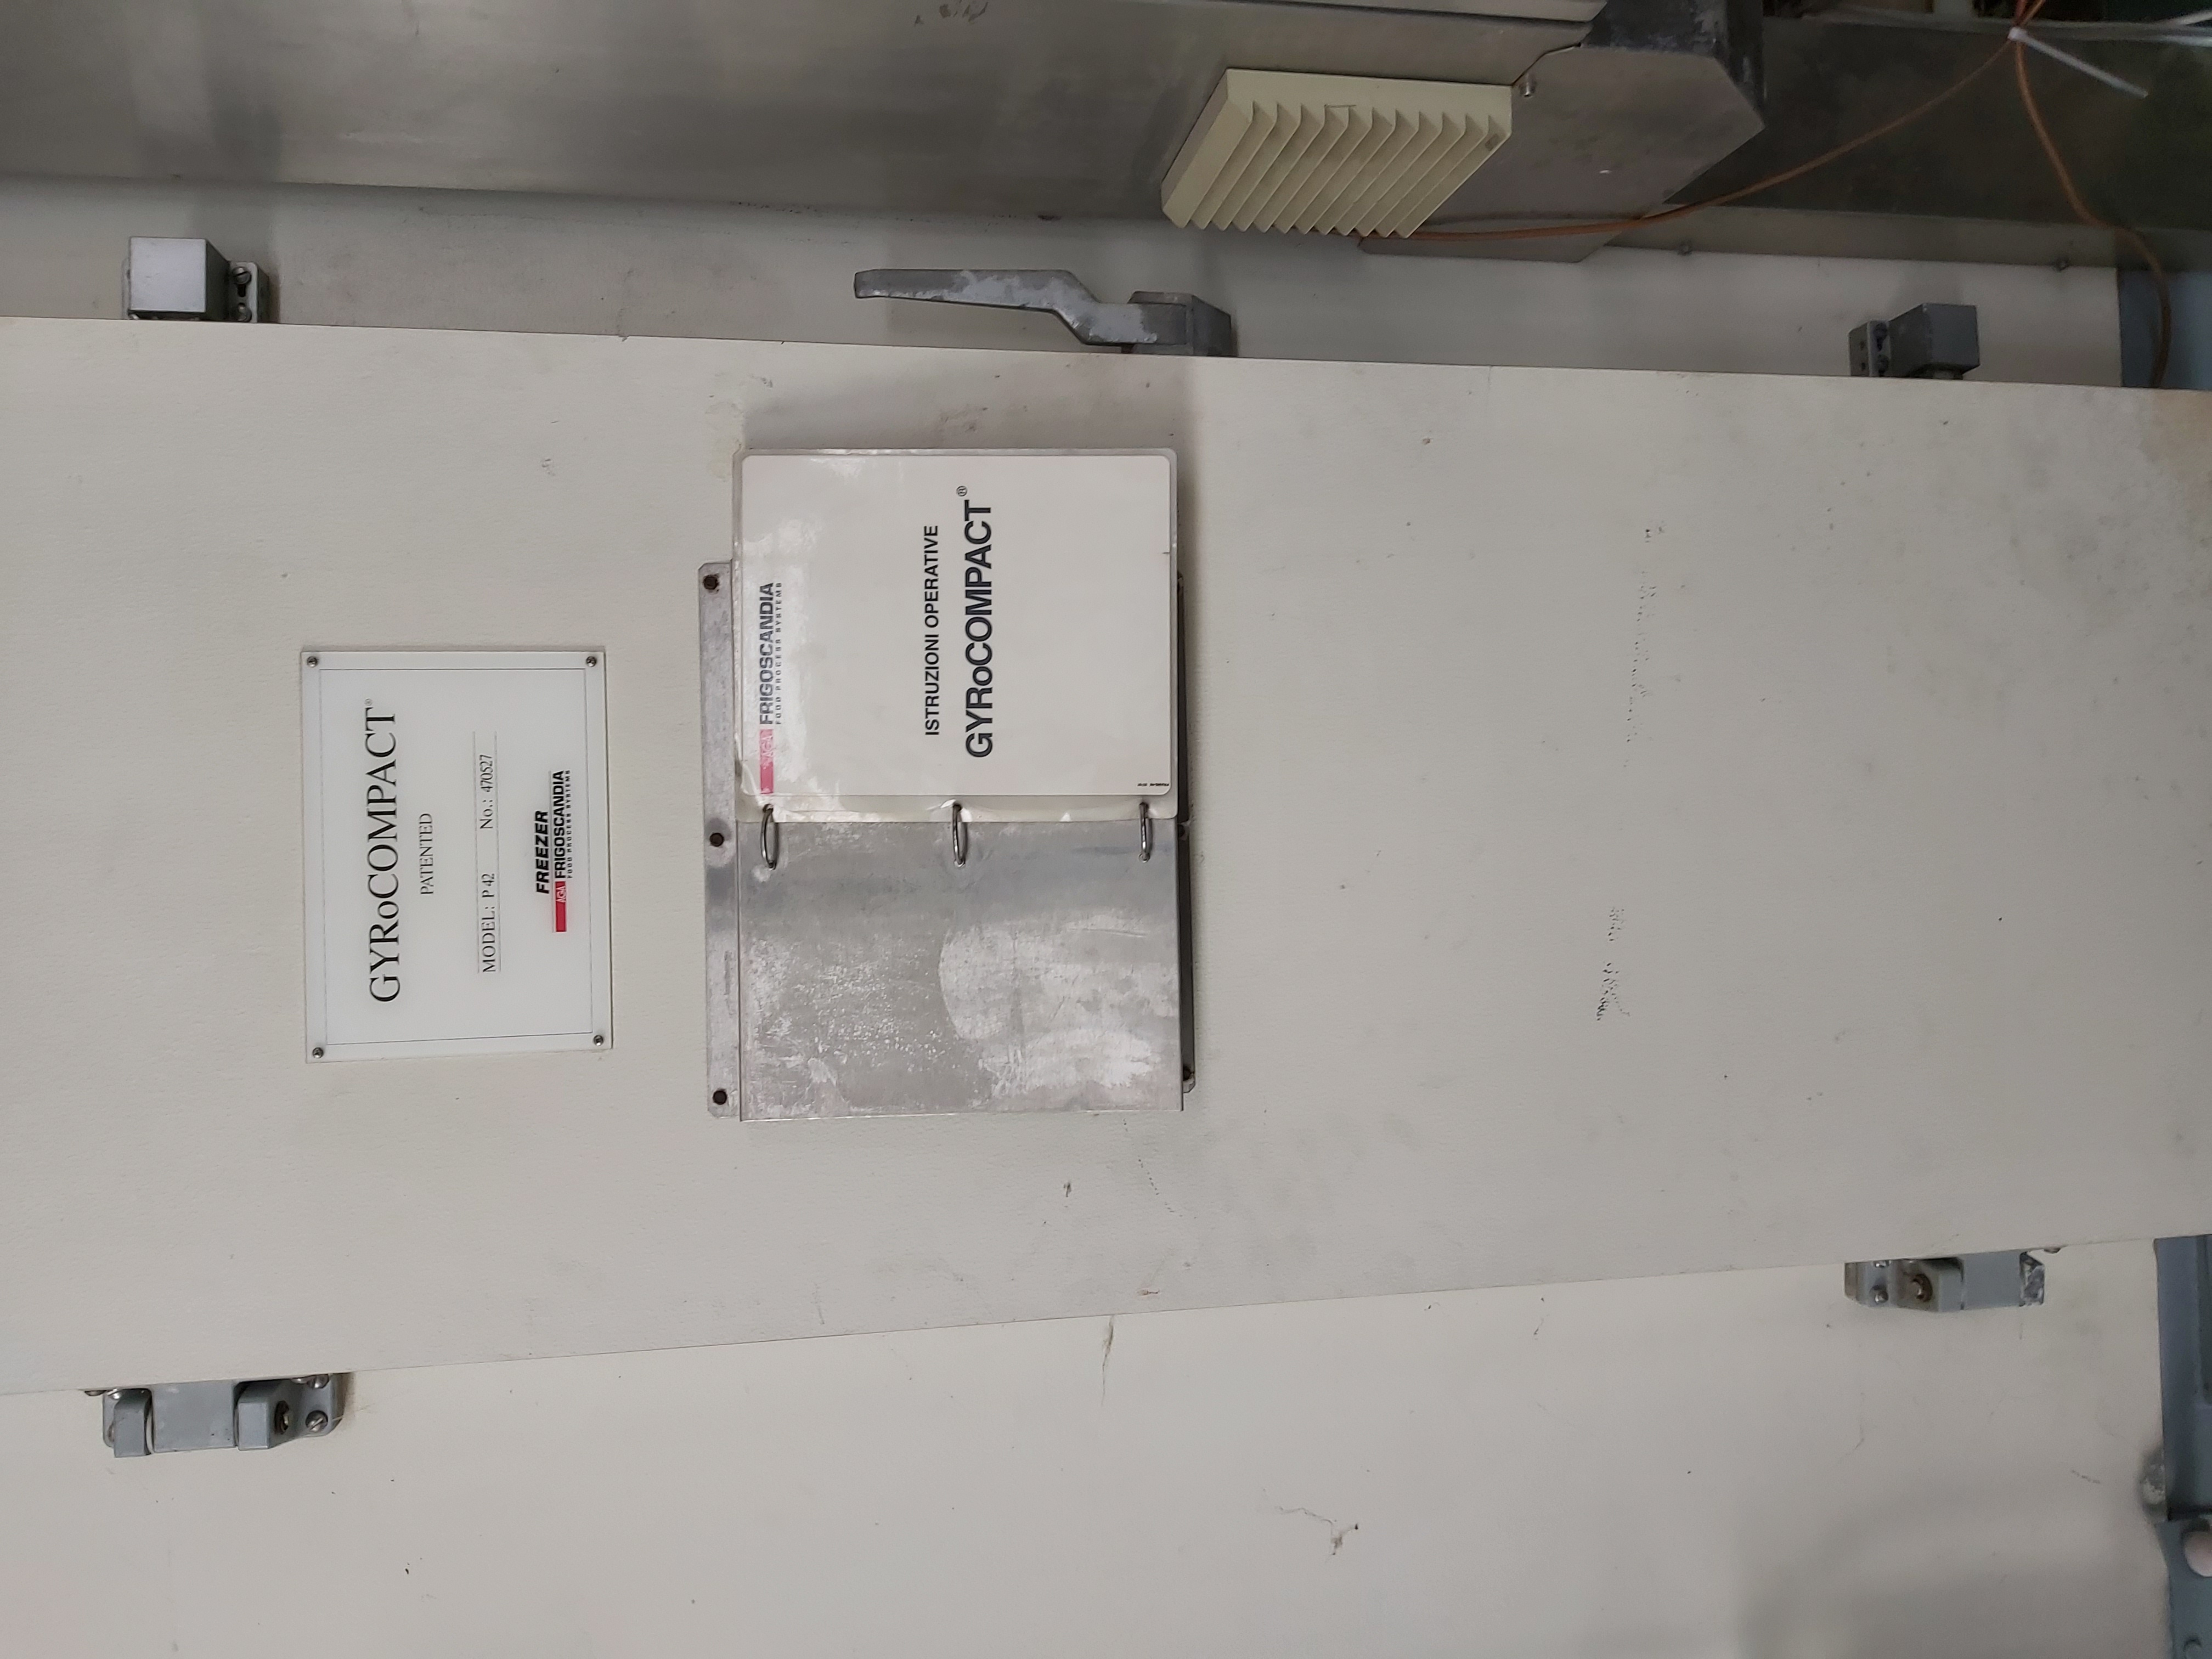 CONGELATORE FRIGOSCANDIA in vendita - foto 2